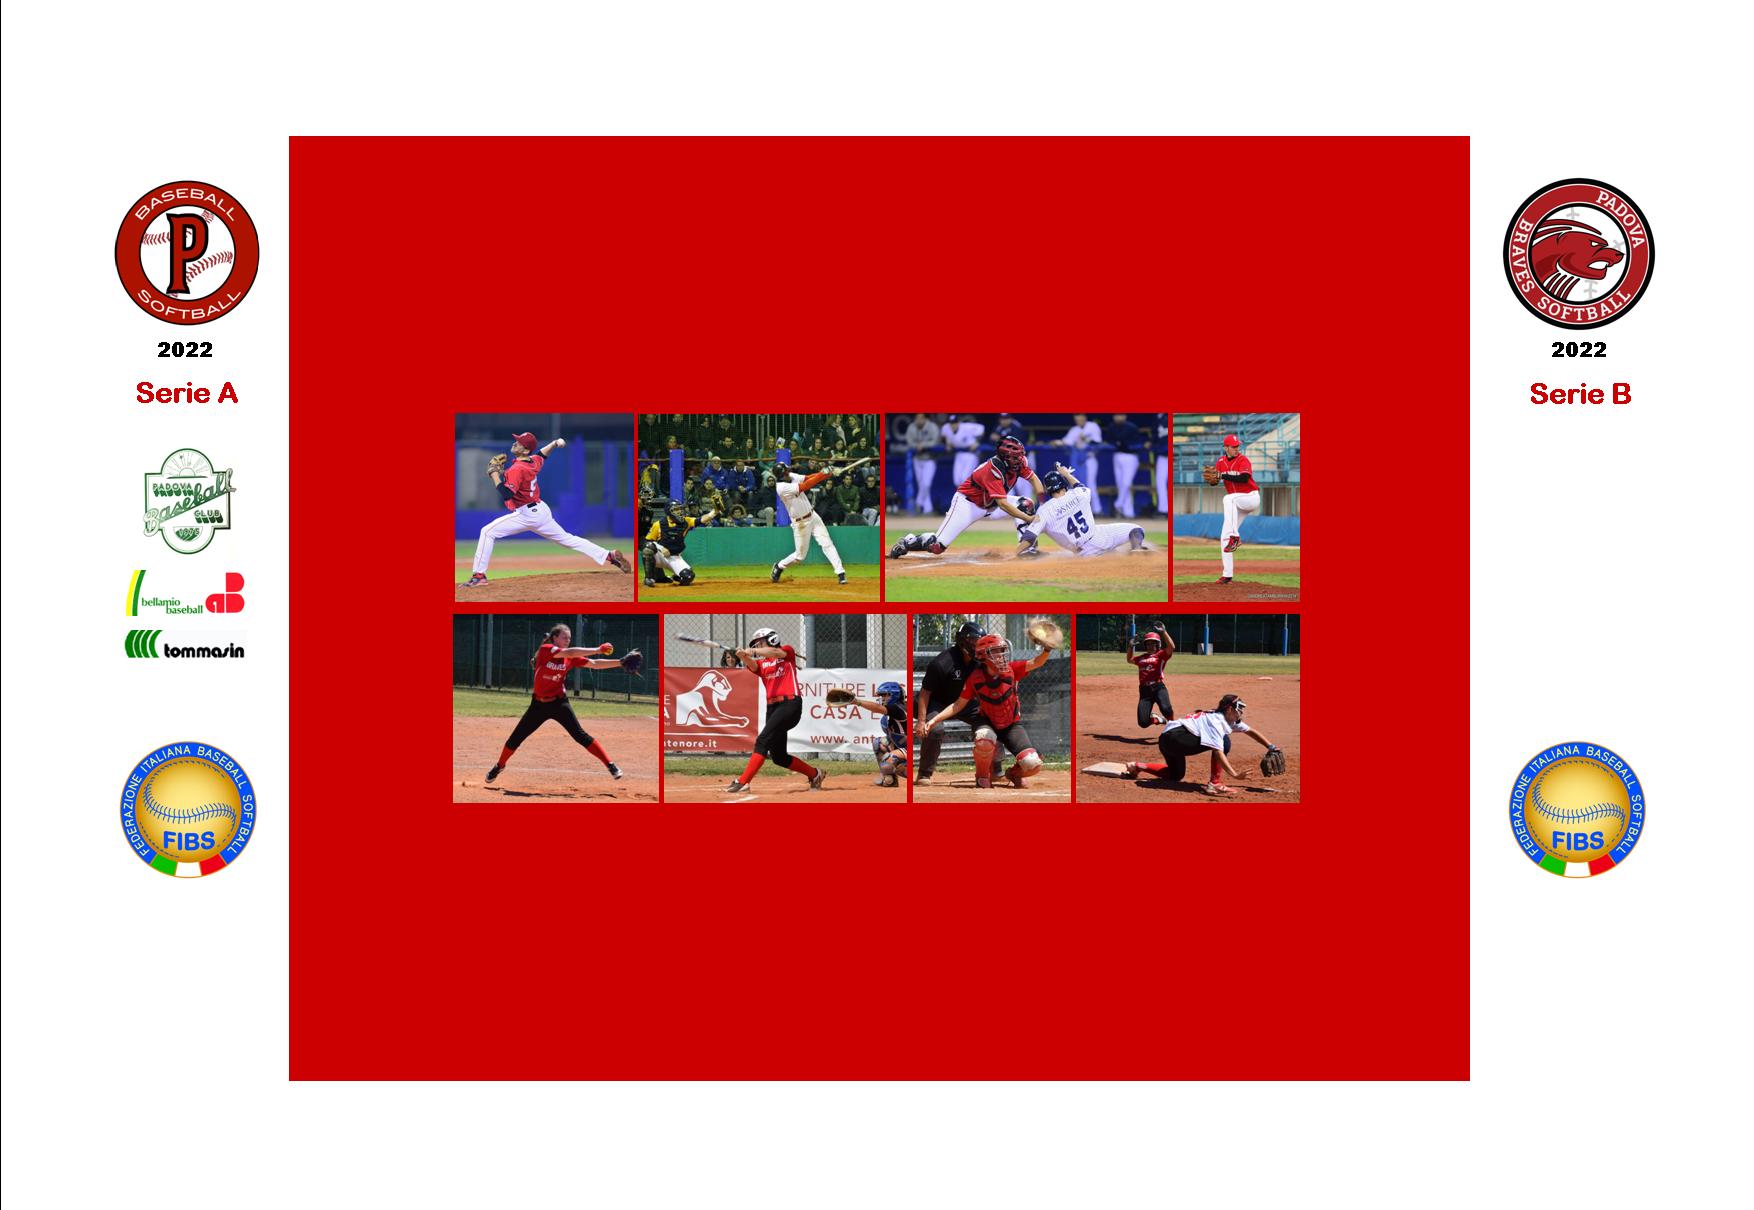 Padova Baseball Softball Club